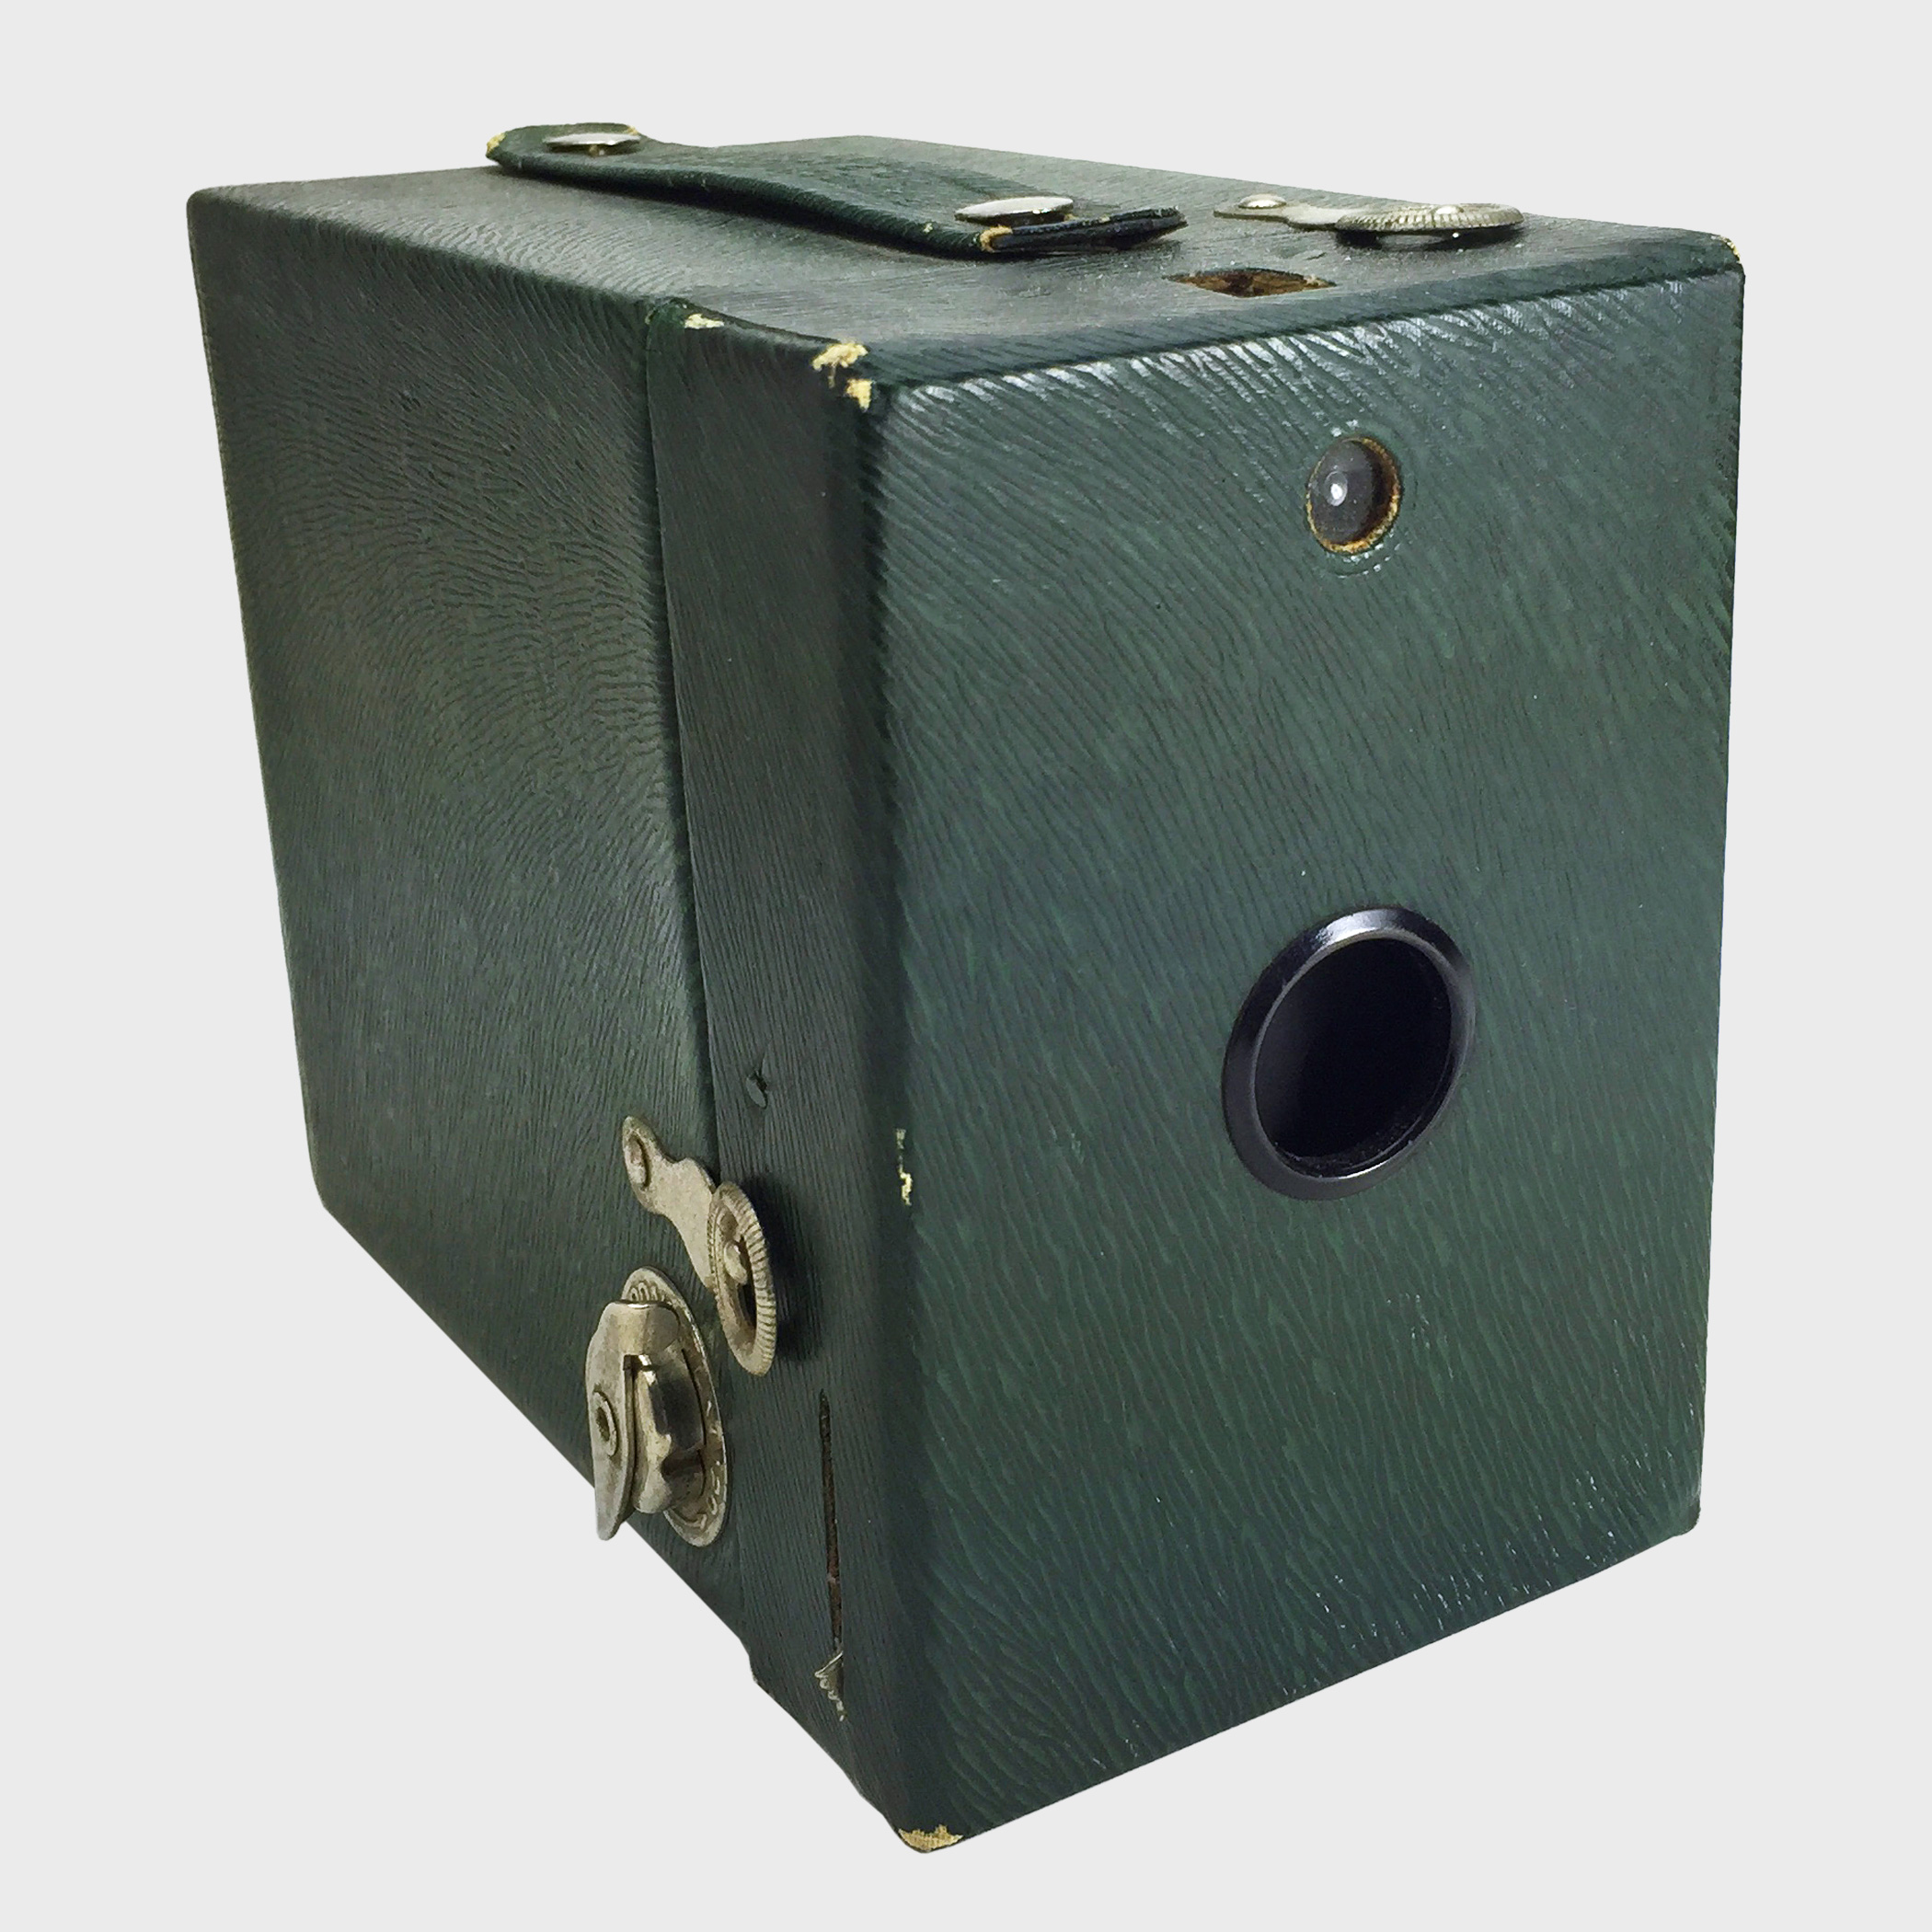 Kodak Rainbow Hawkeye No. 2 Model C - Green